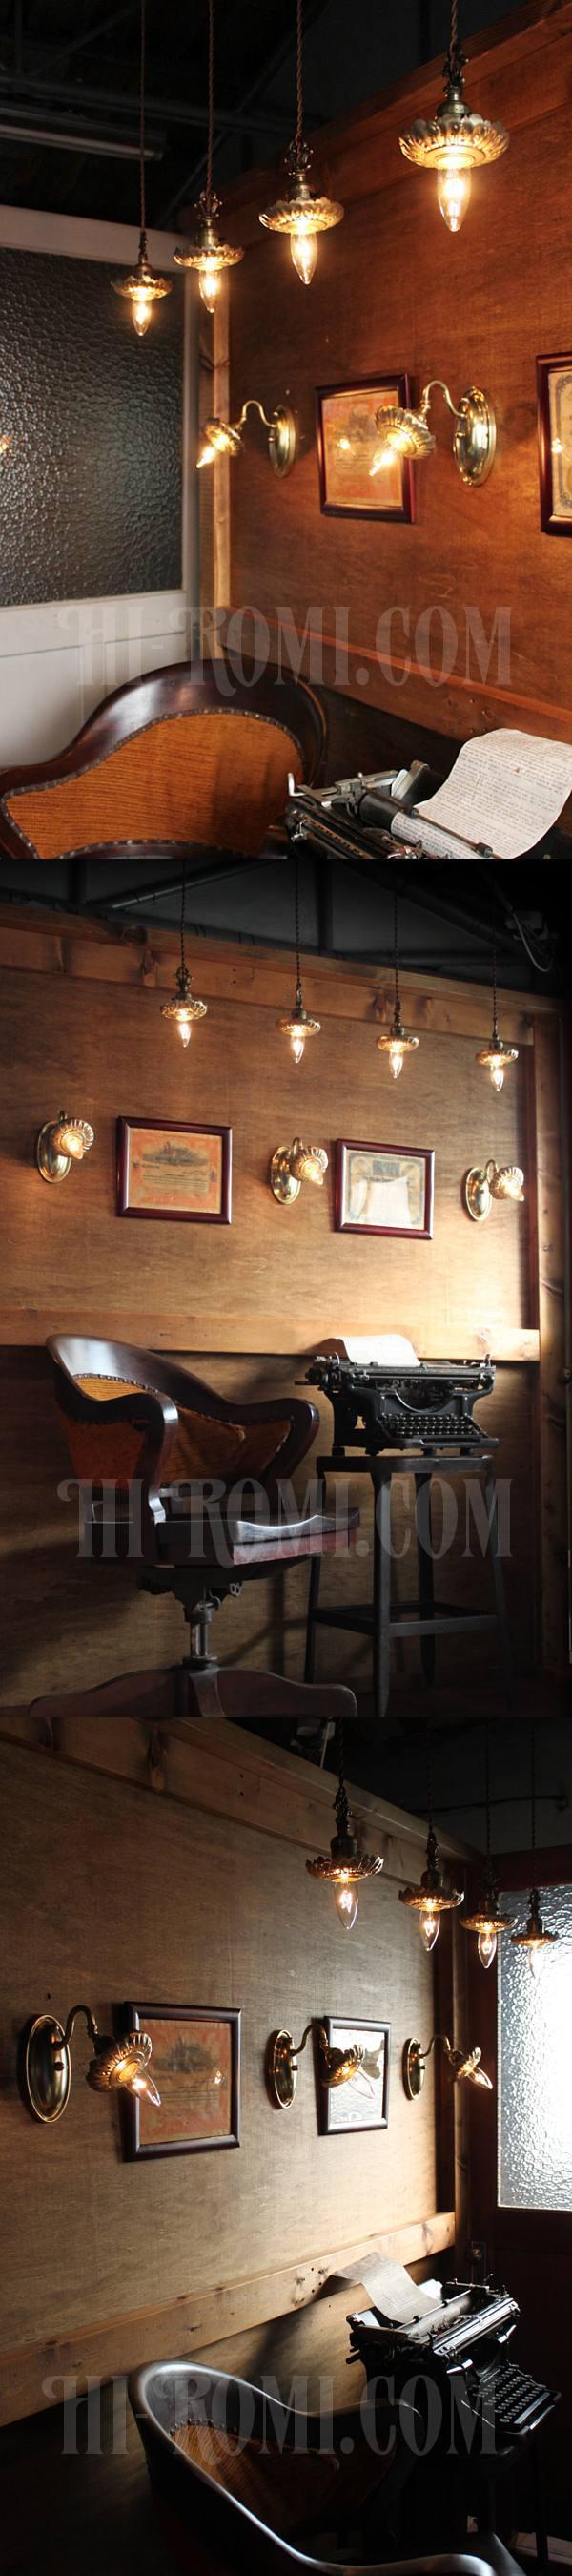 USAヴィンテージ真鍮製花型フレーム付きプッシュ式ブラケットランプ/アンティークヴィクトリアンアトリエ壁掛けウォールライト